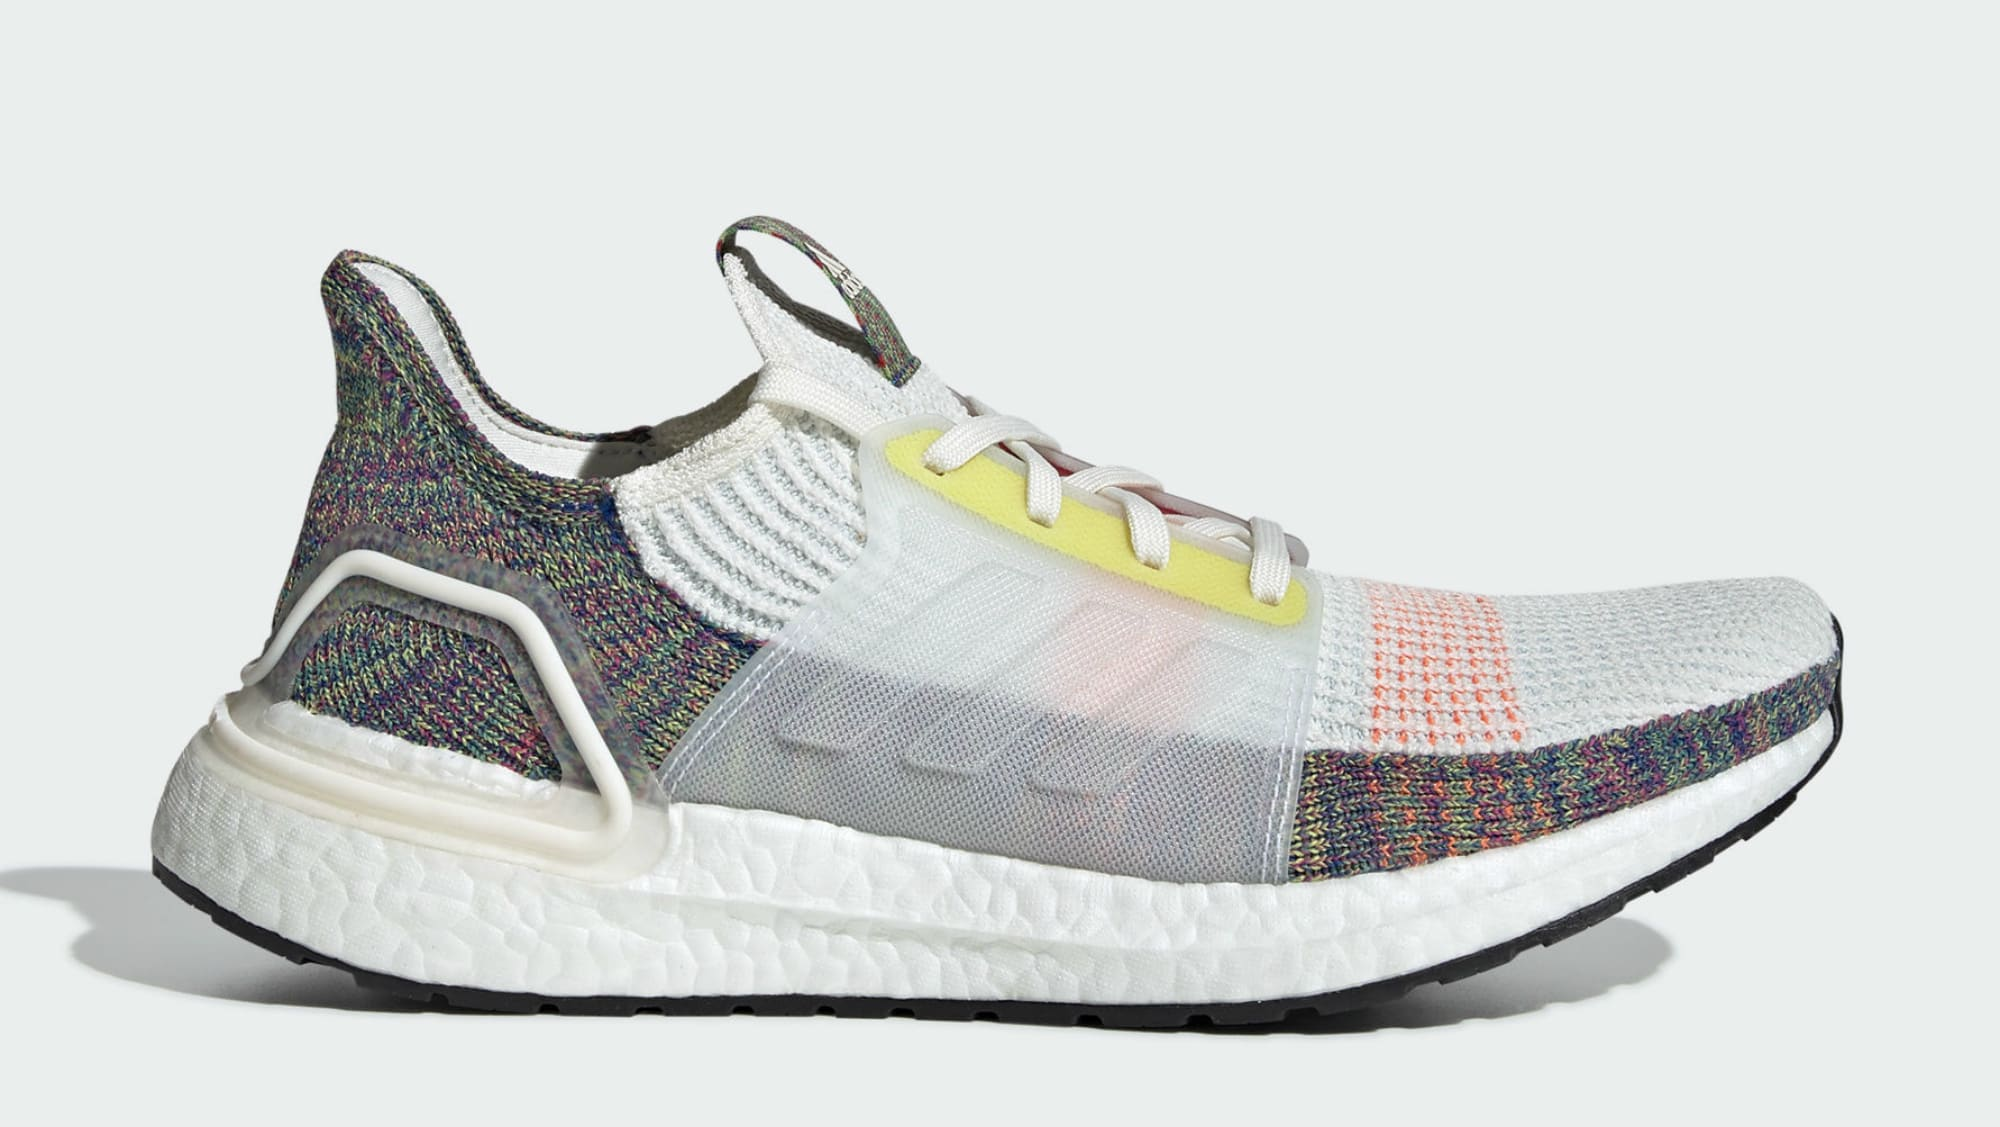 adidas-ultra-boost-19-pride-2019-ef3675-release-date